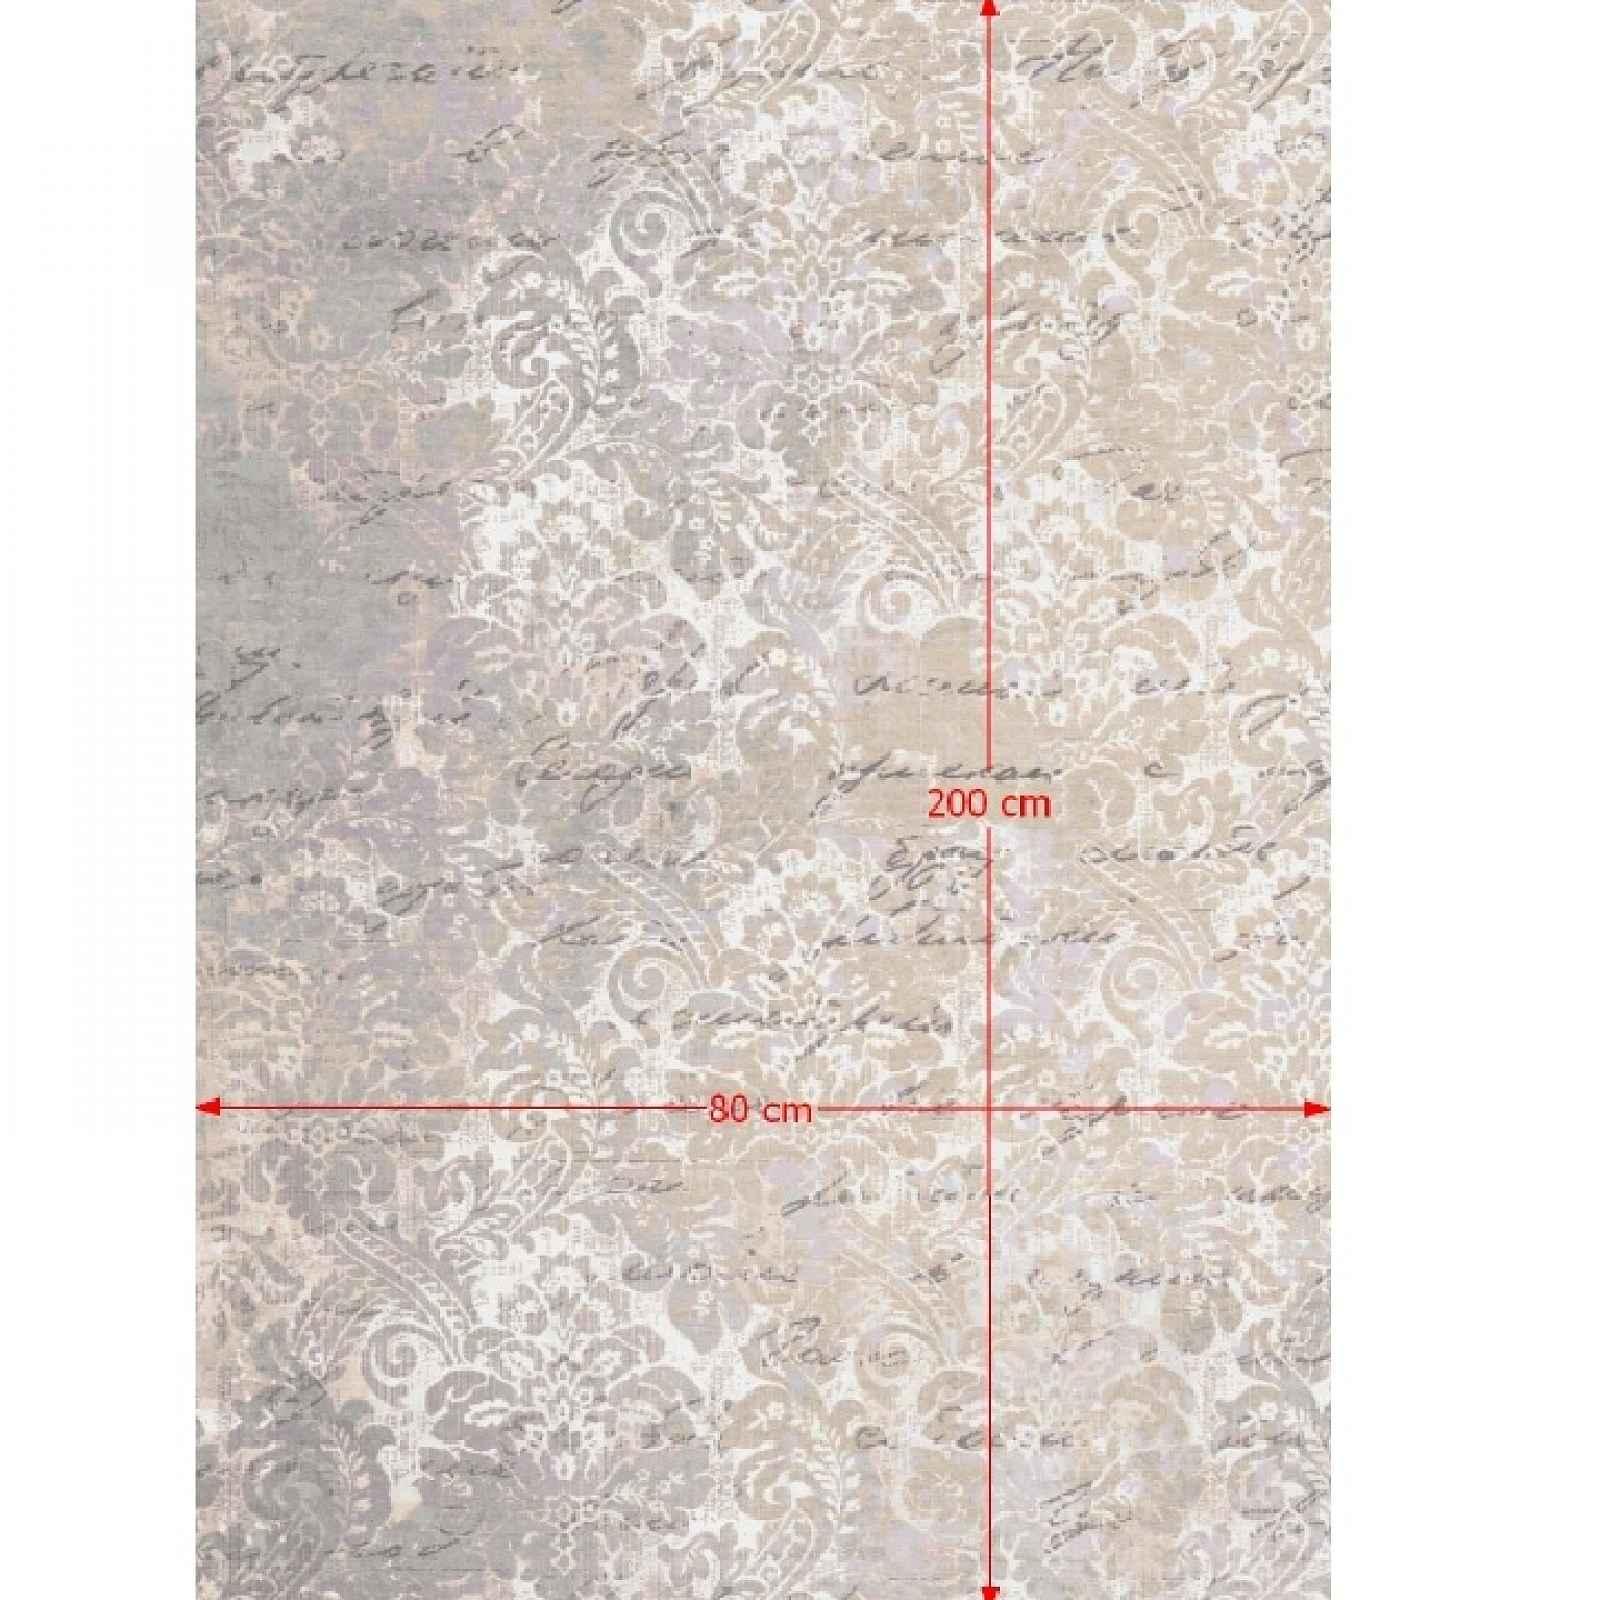 Koberec s třásněmi BALIN béžová / vzor Tempo Kondela 80x200 cm